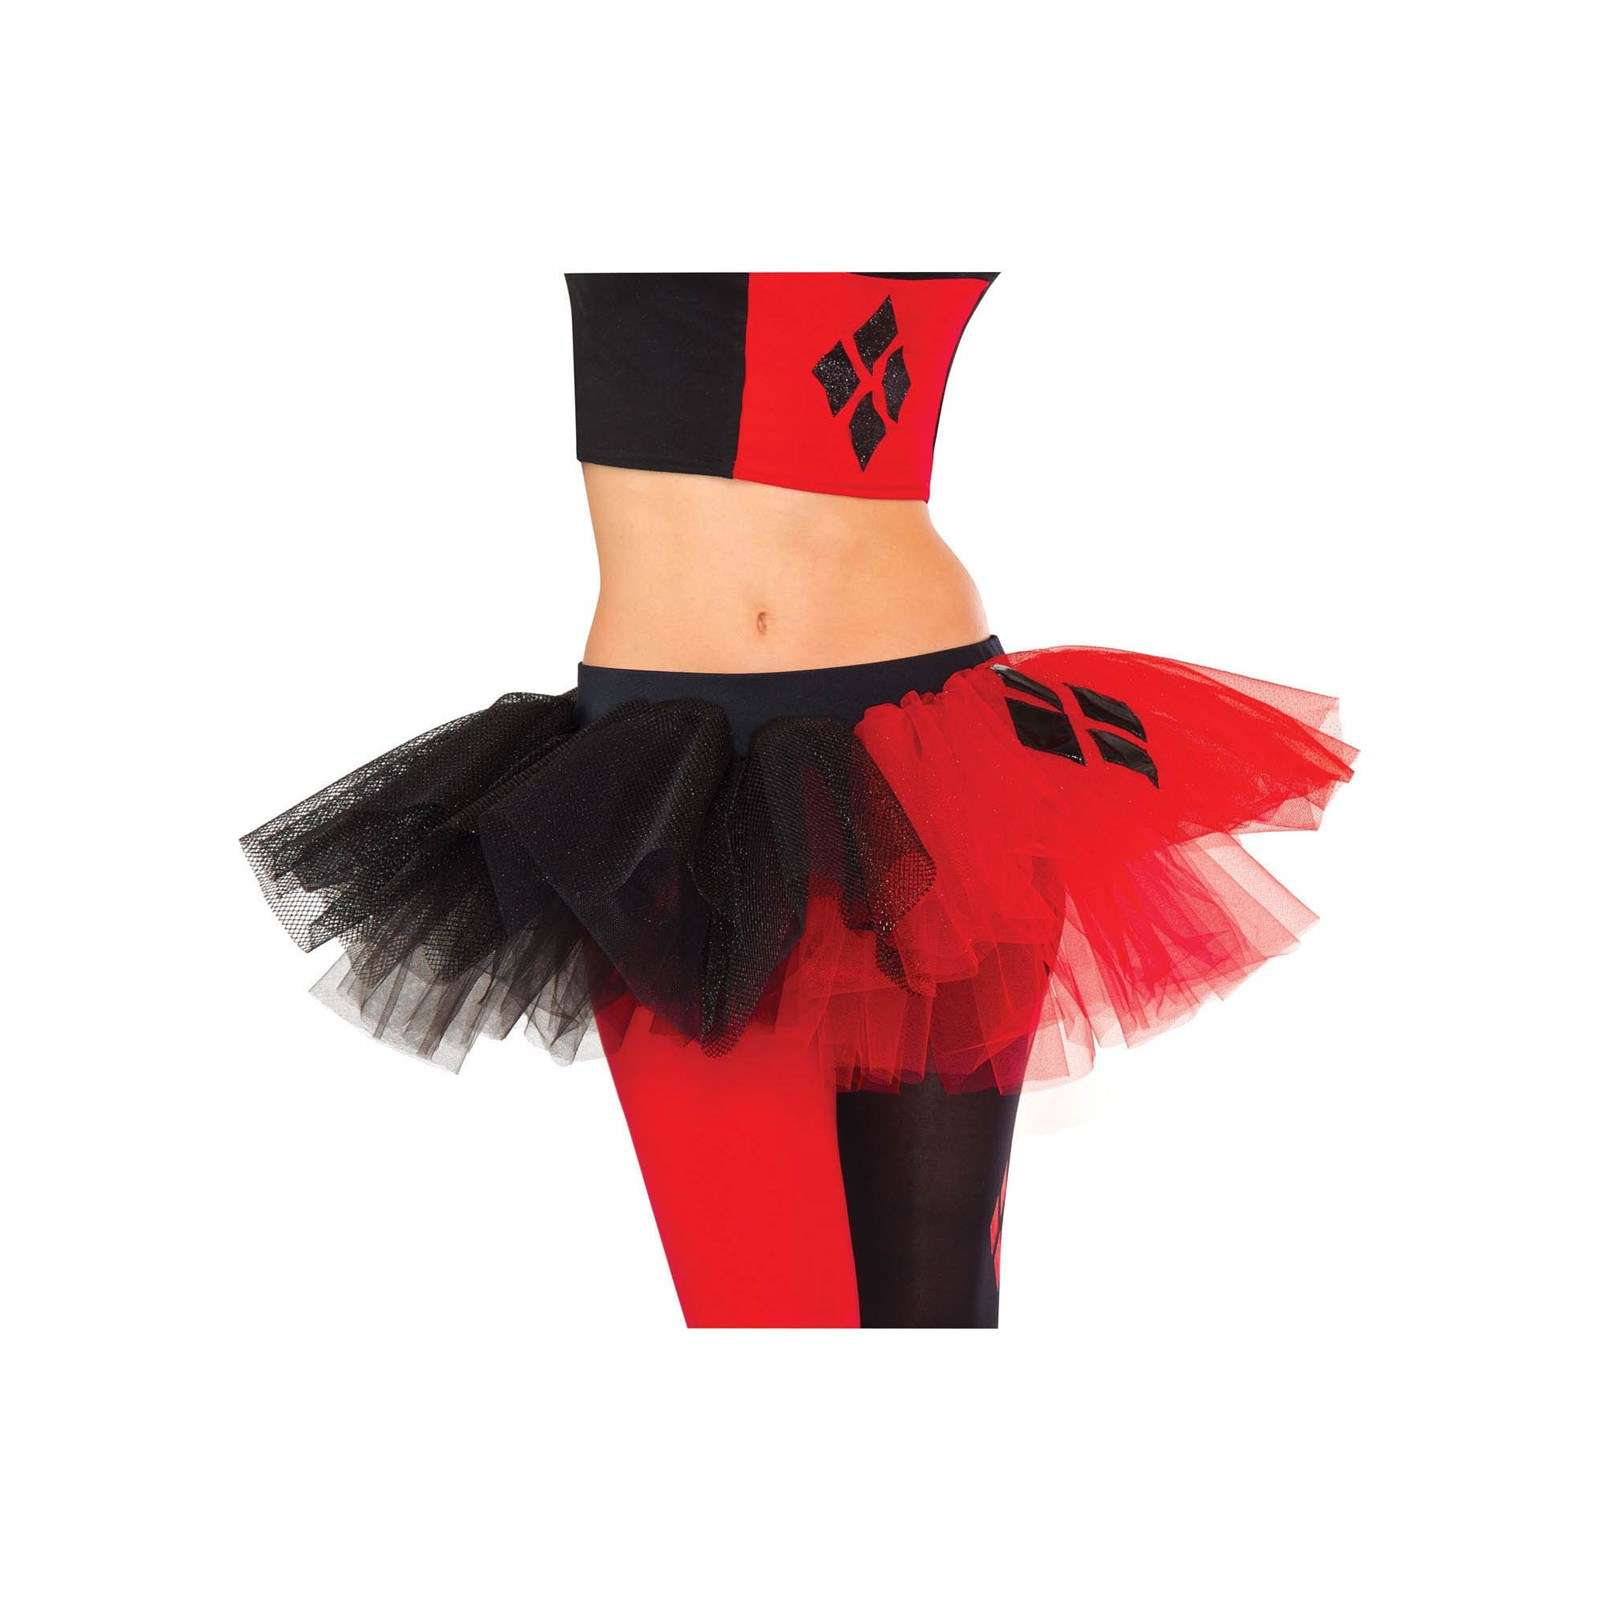 Harley Quinn Tutu Skirt Adult Womens Costume Accessory NEW Standard Size